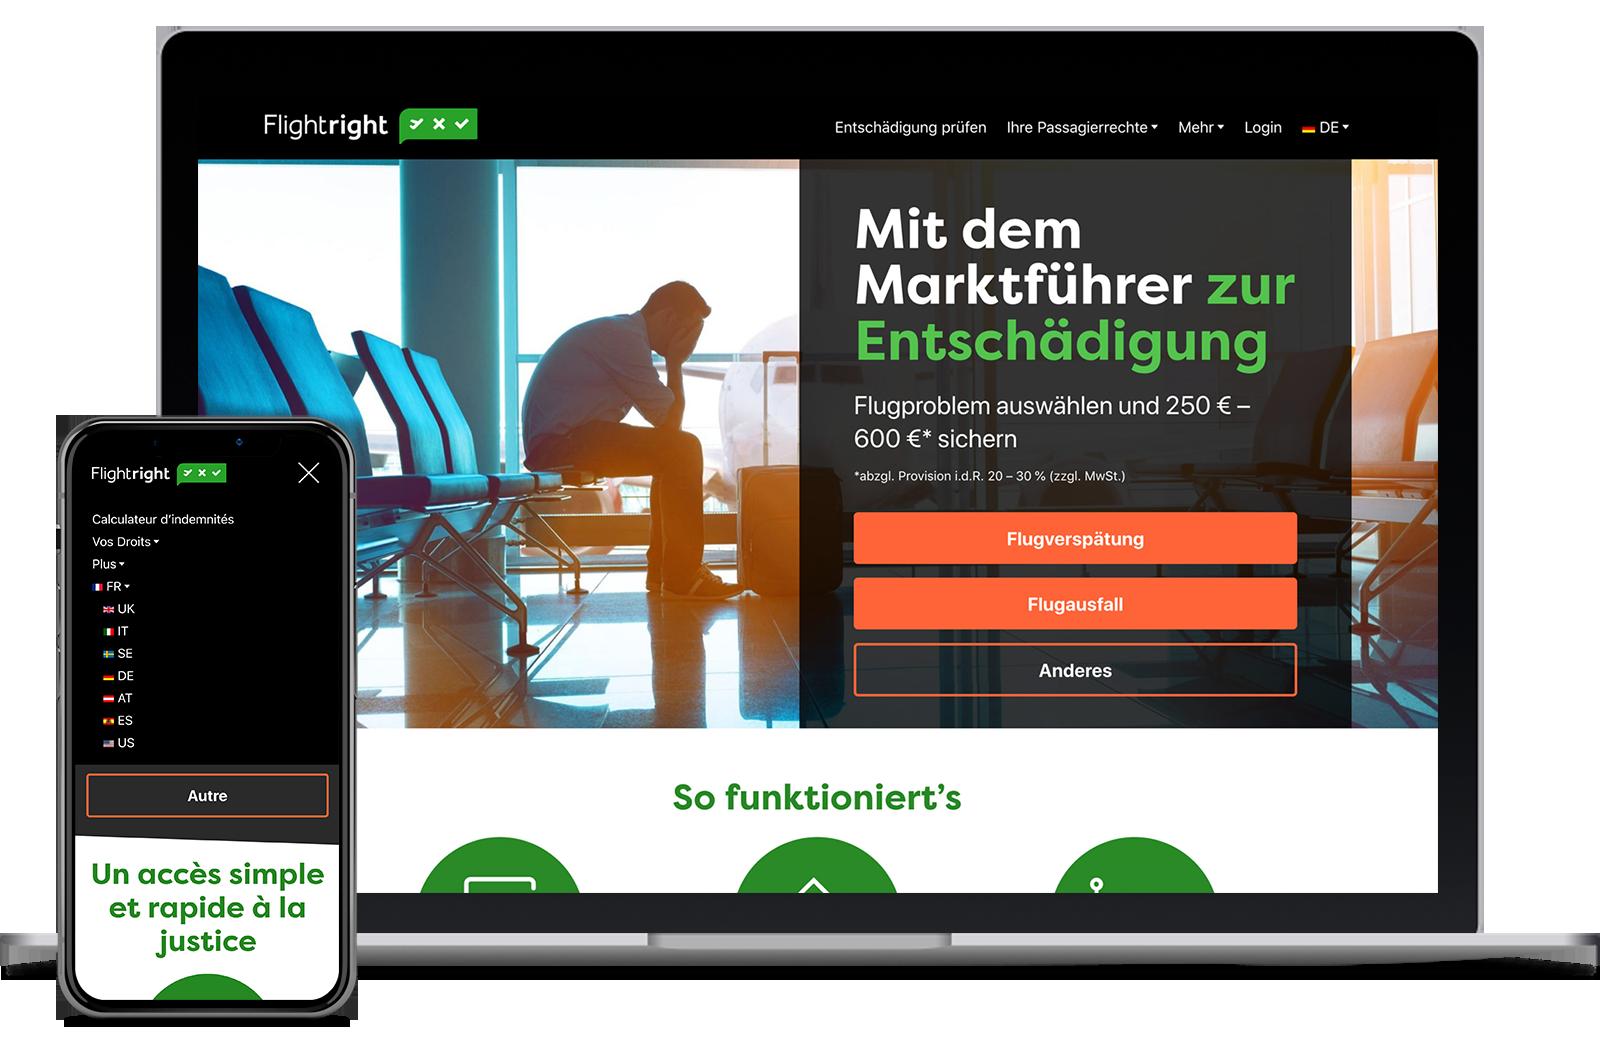 Flightright Multilingual Multisite Network